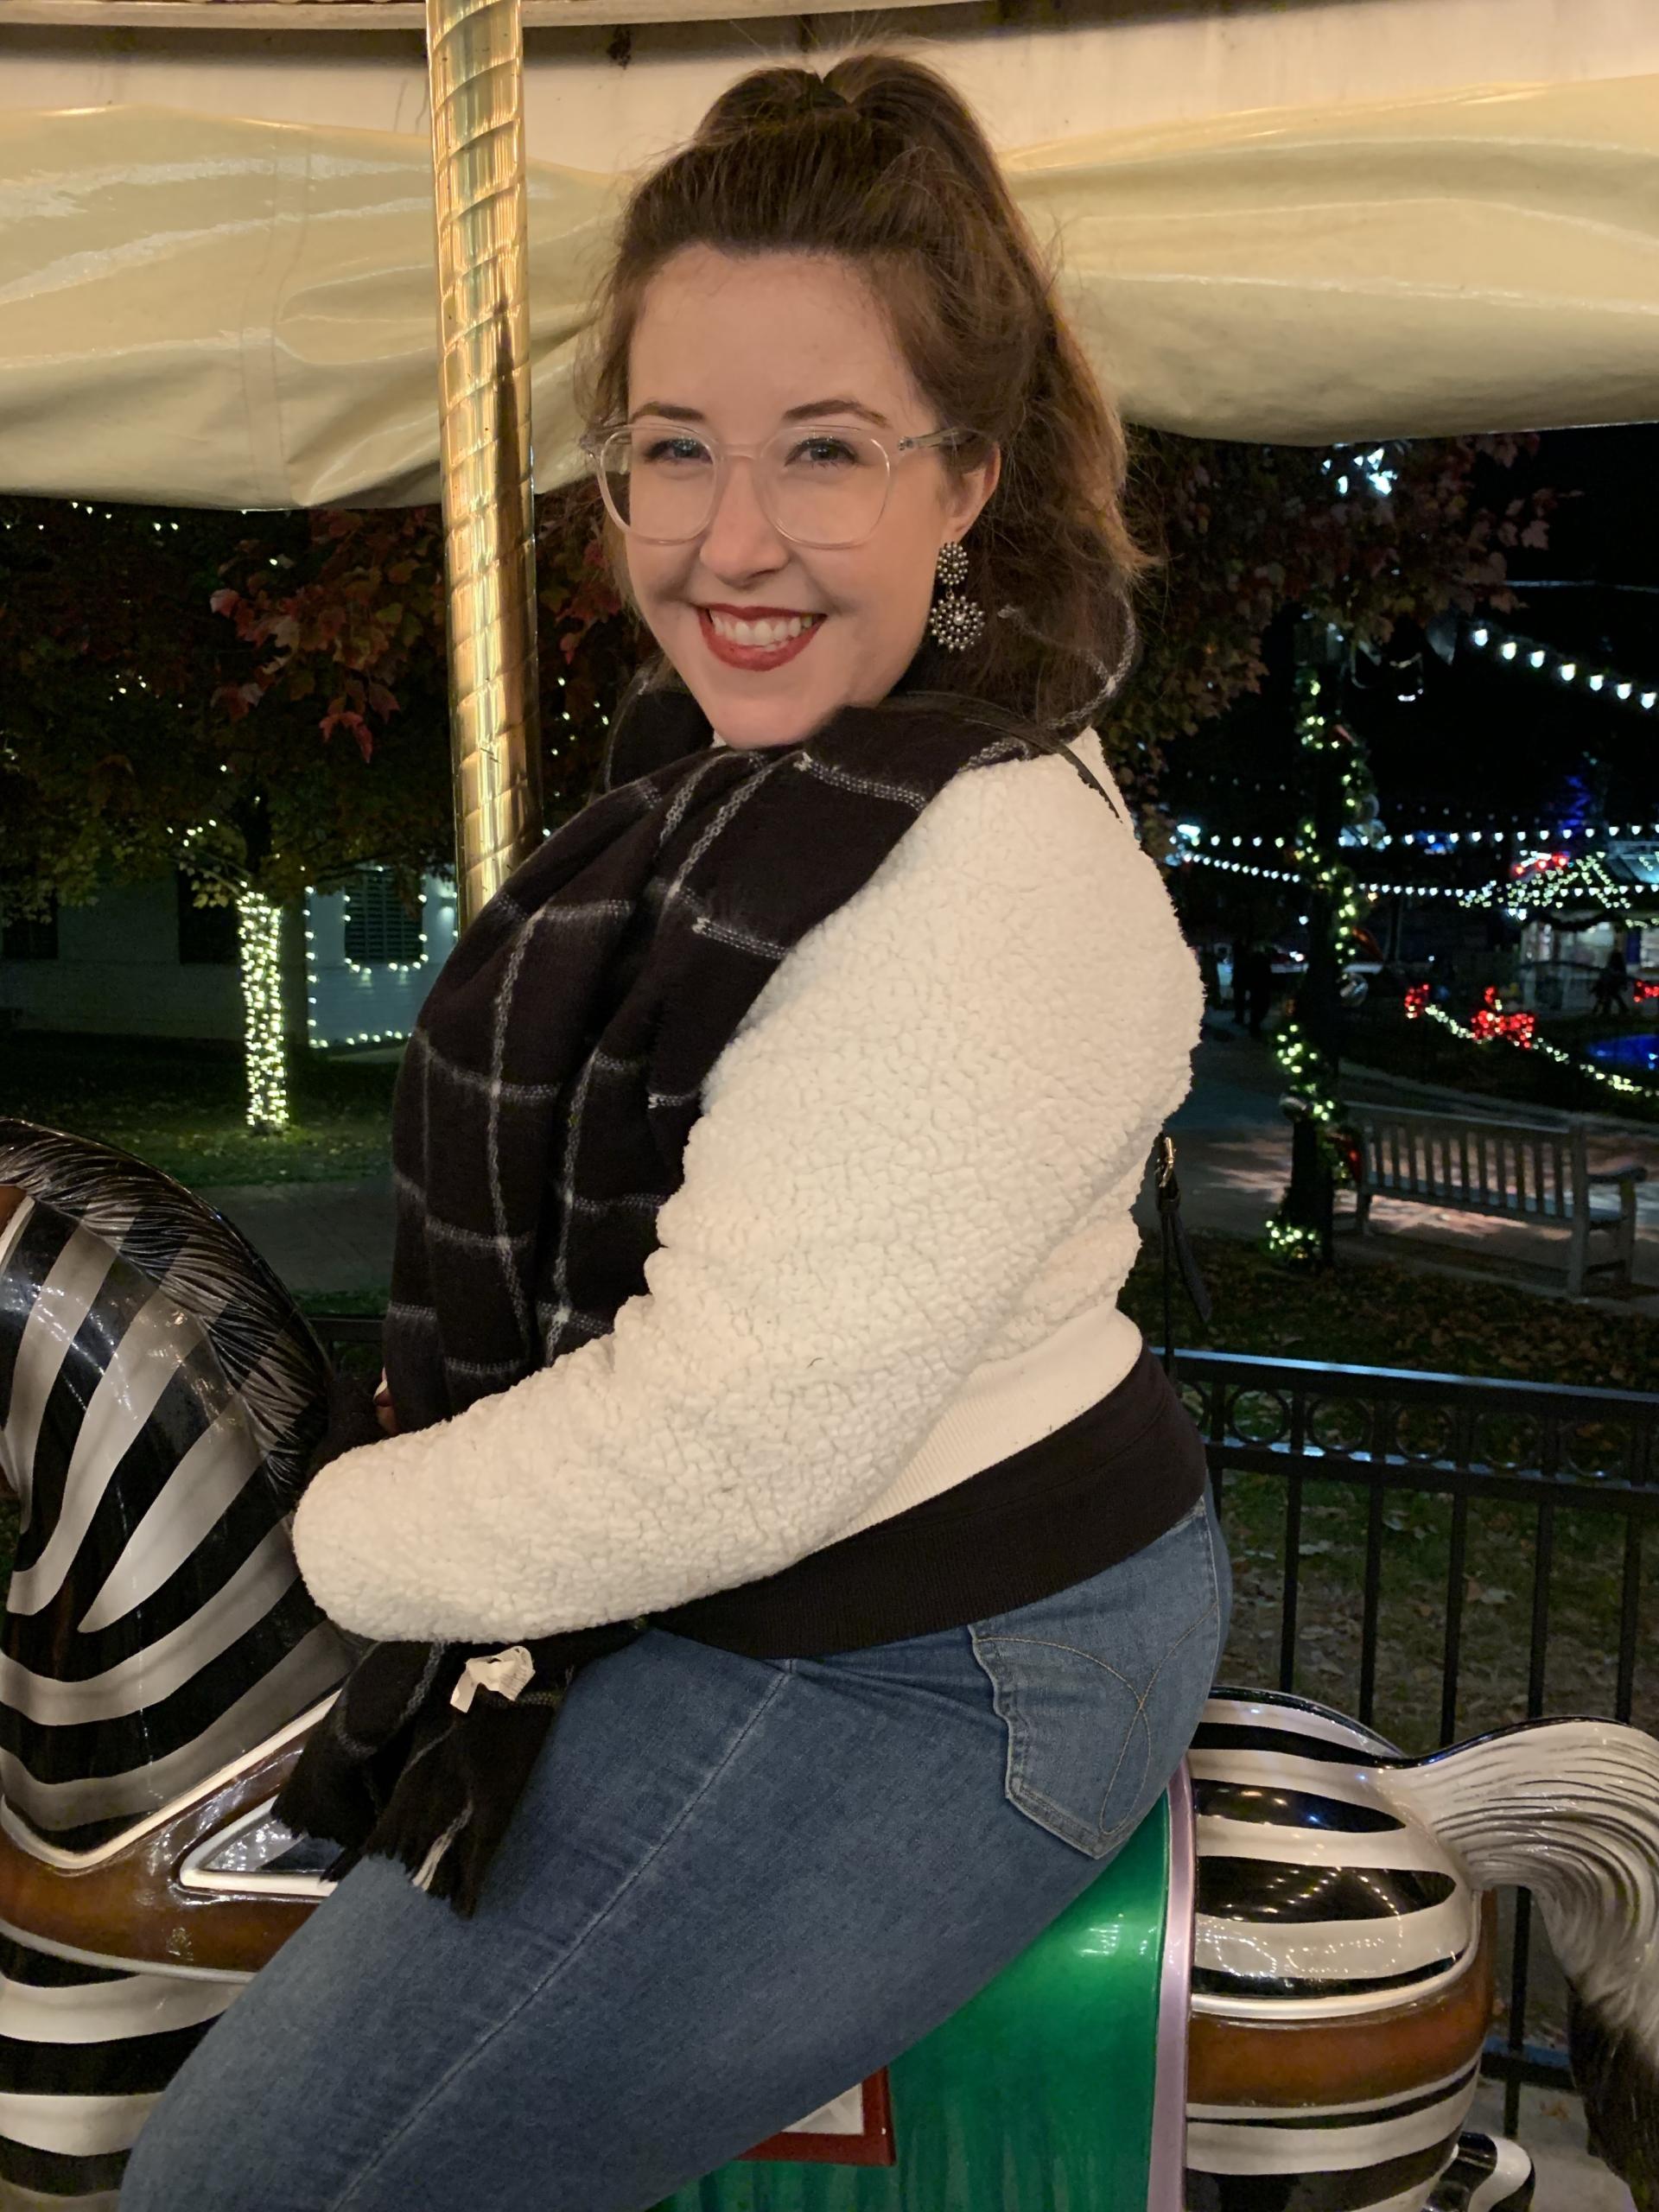 Franklin Square carousel